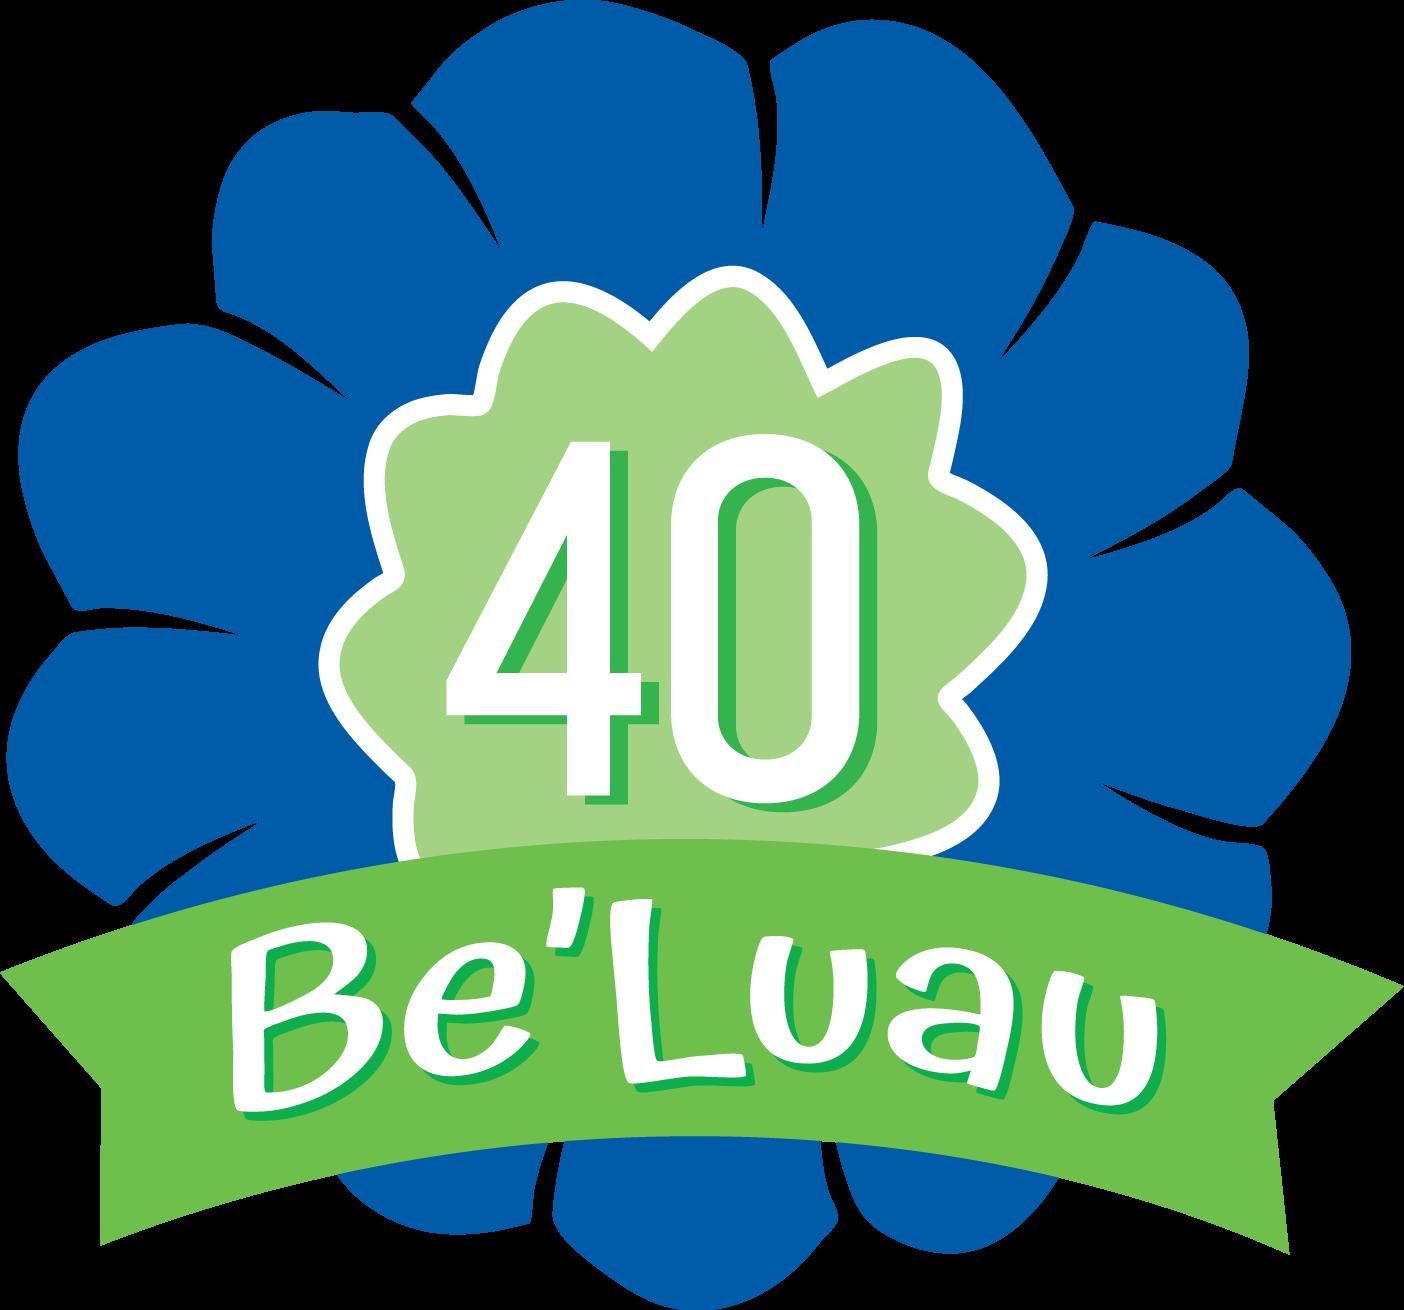 40 Be'Luau Event Logo